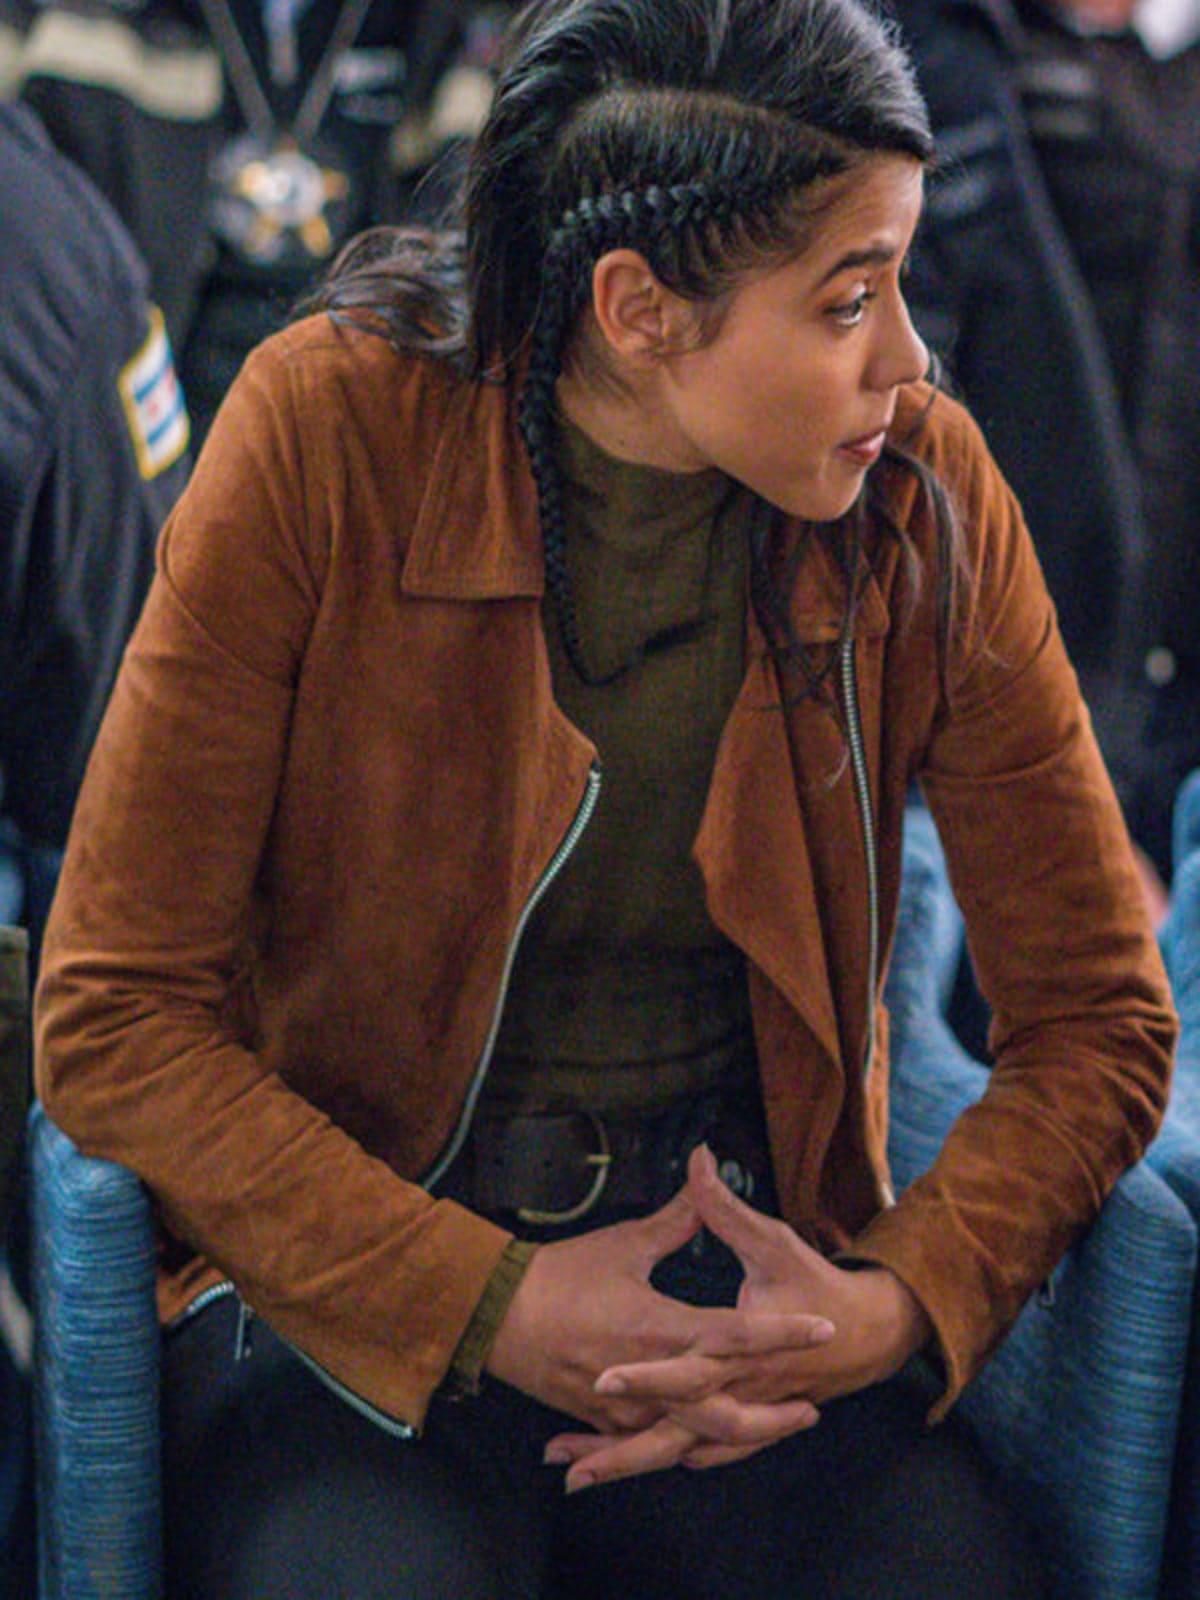 Vanessa Rojas Chicago PD S07 Suede Jacket